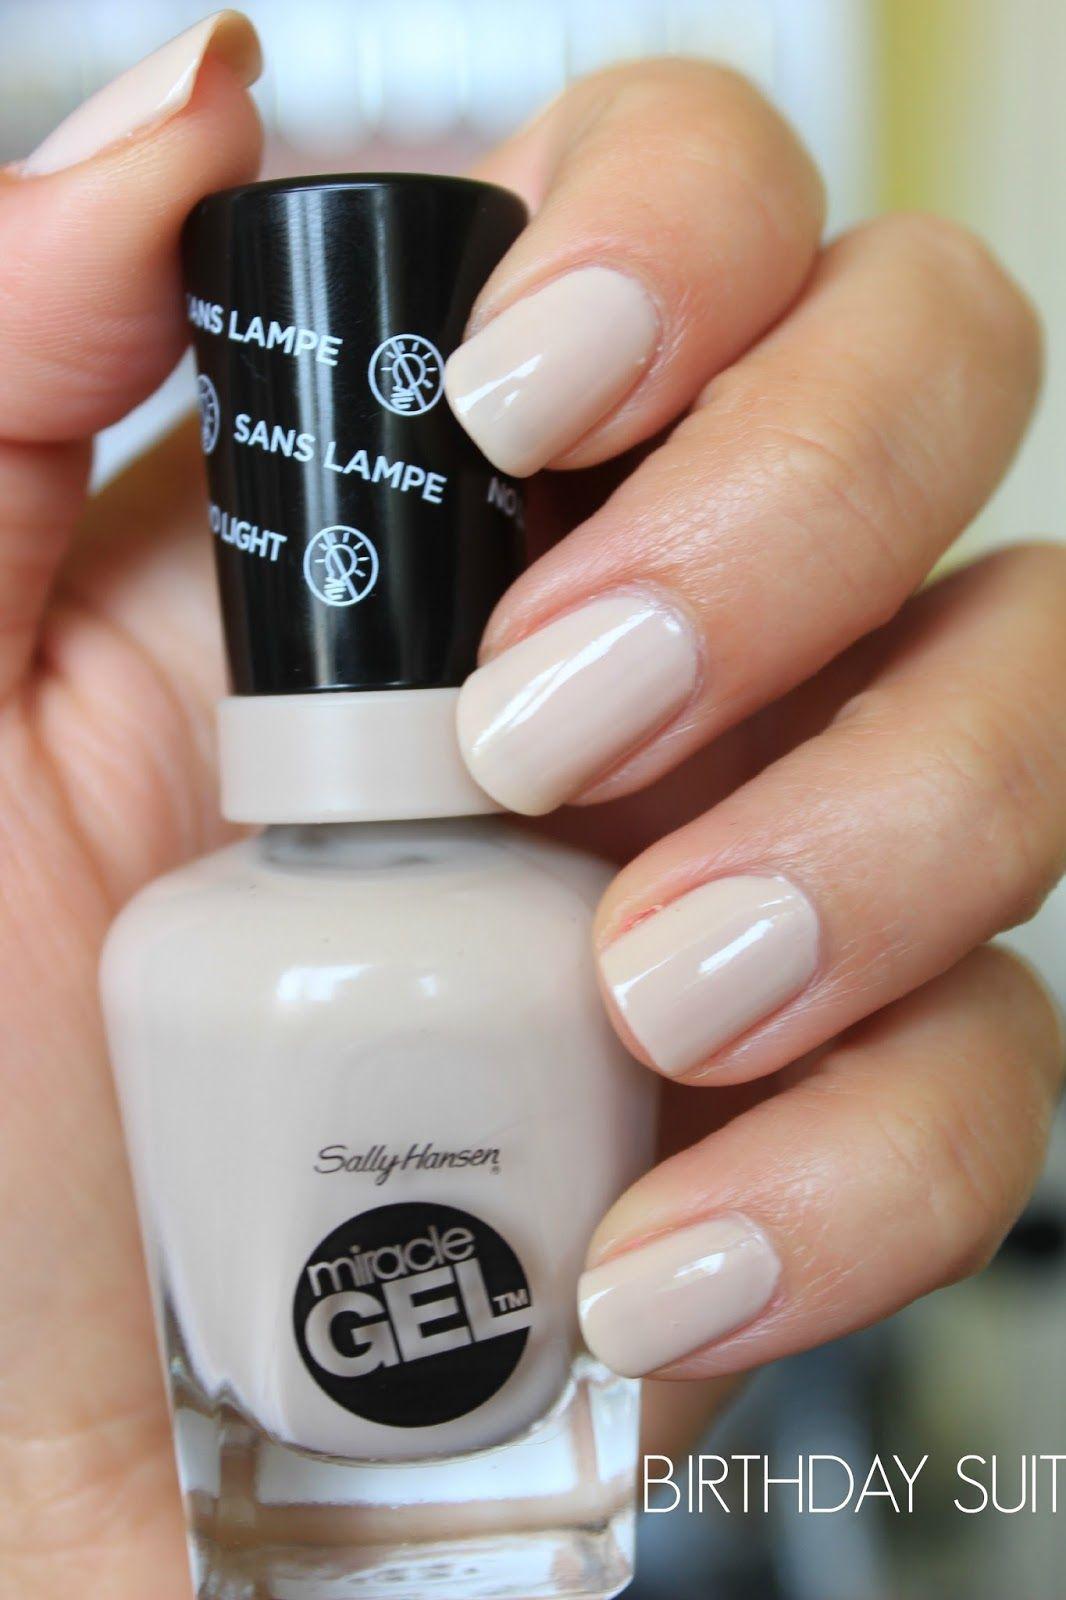 procedure for sally hansens gel nails photo - 1